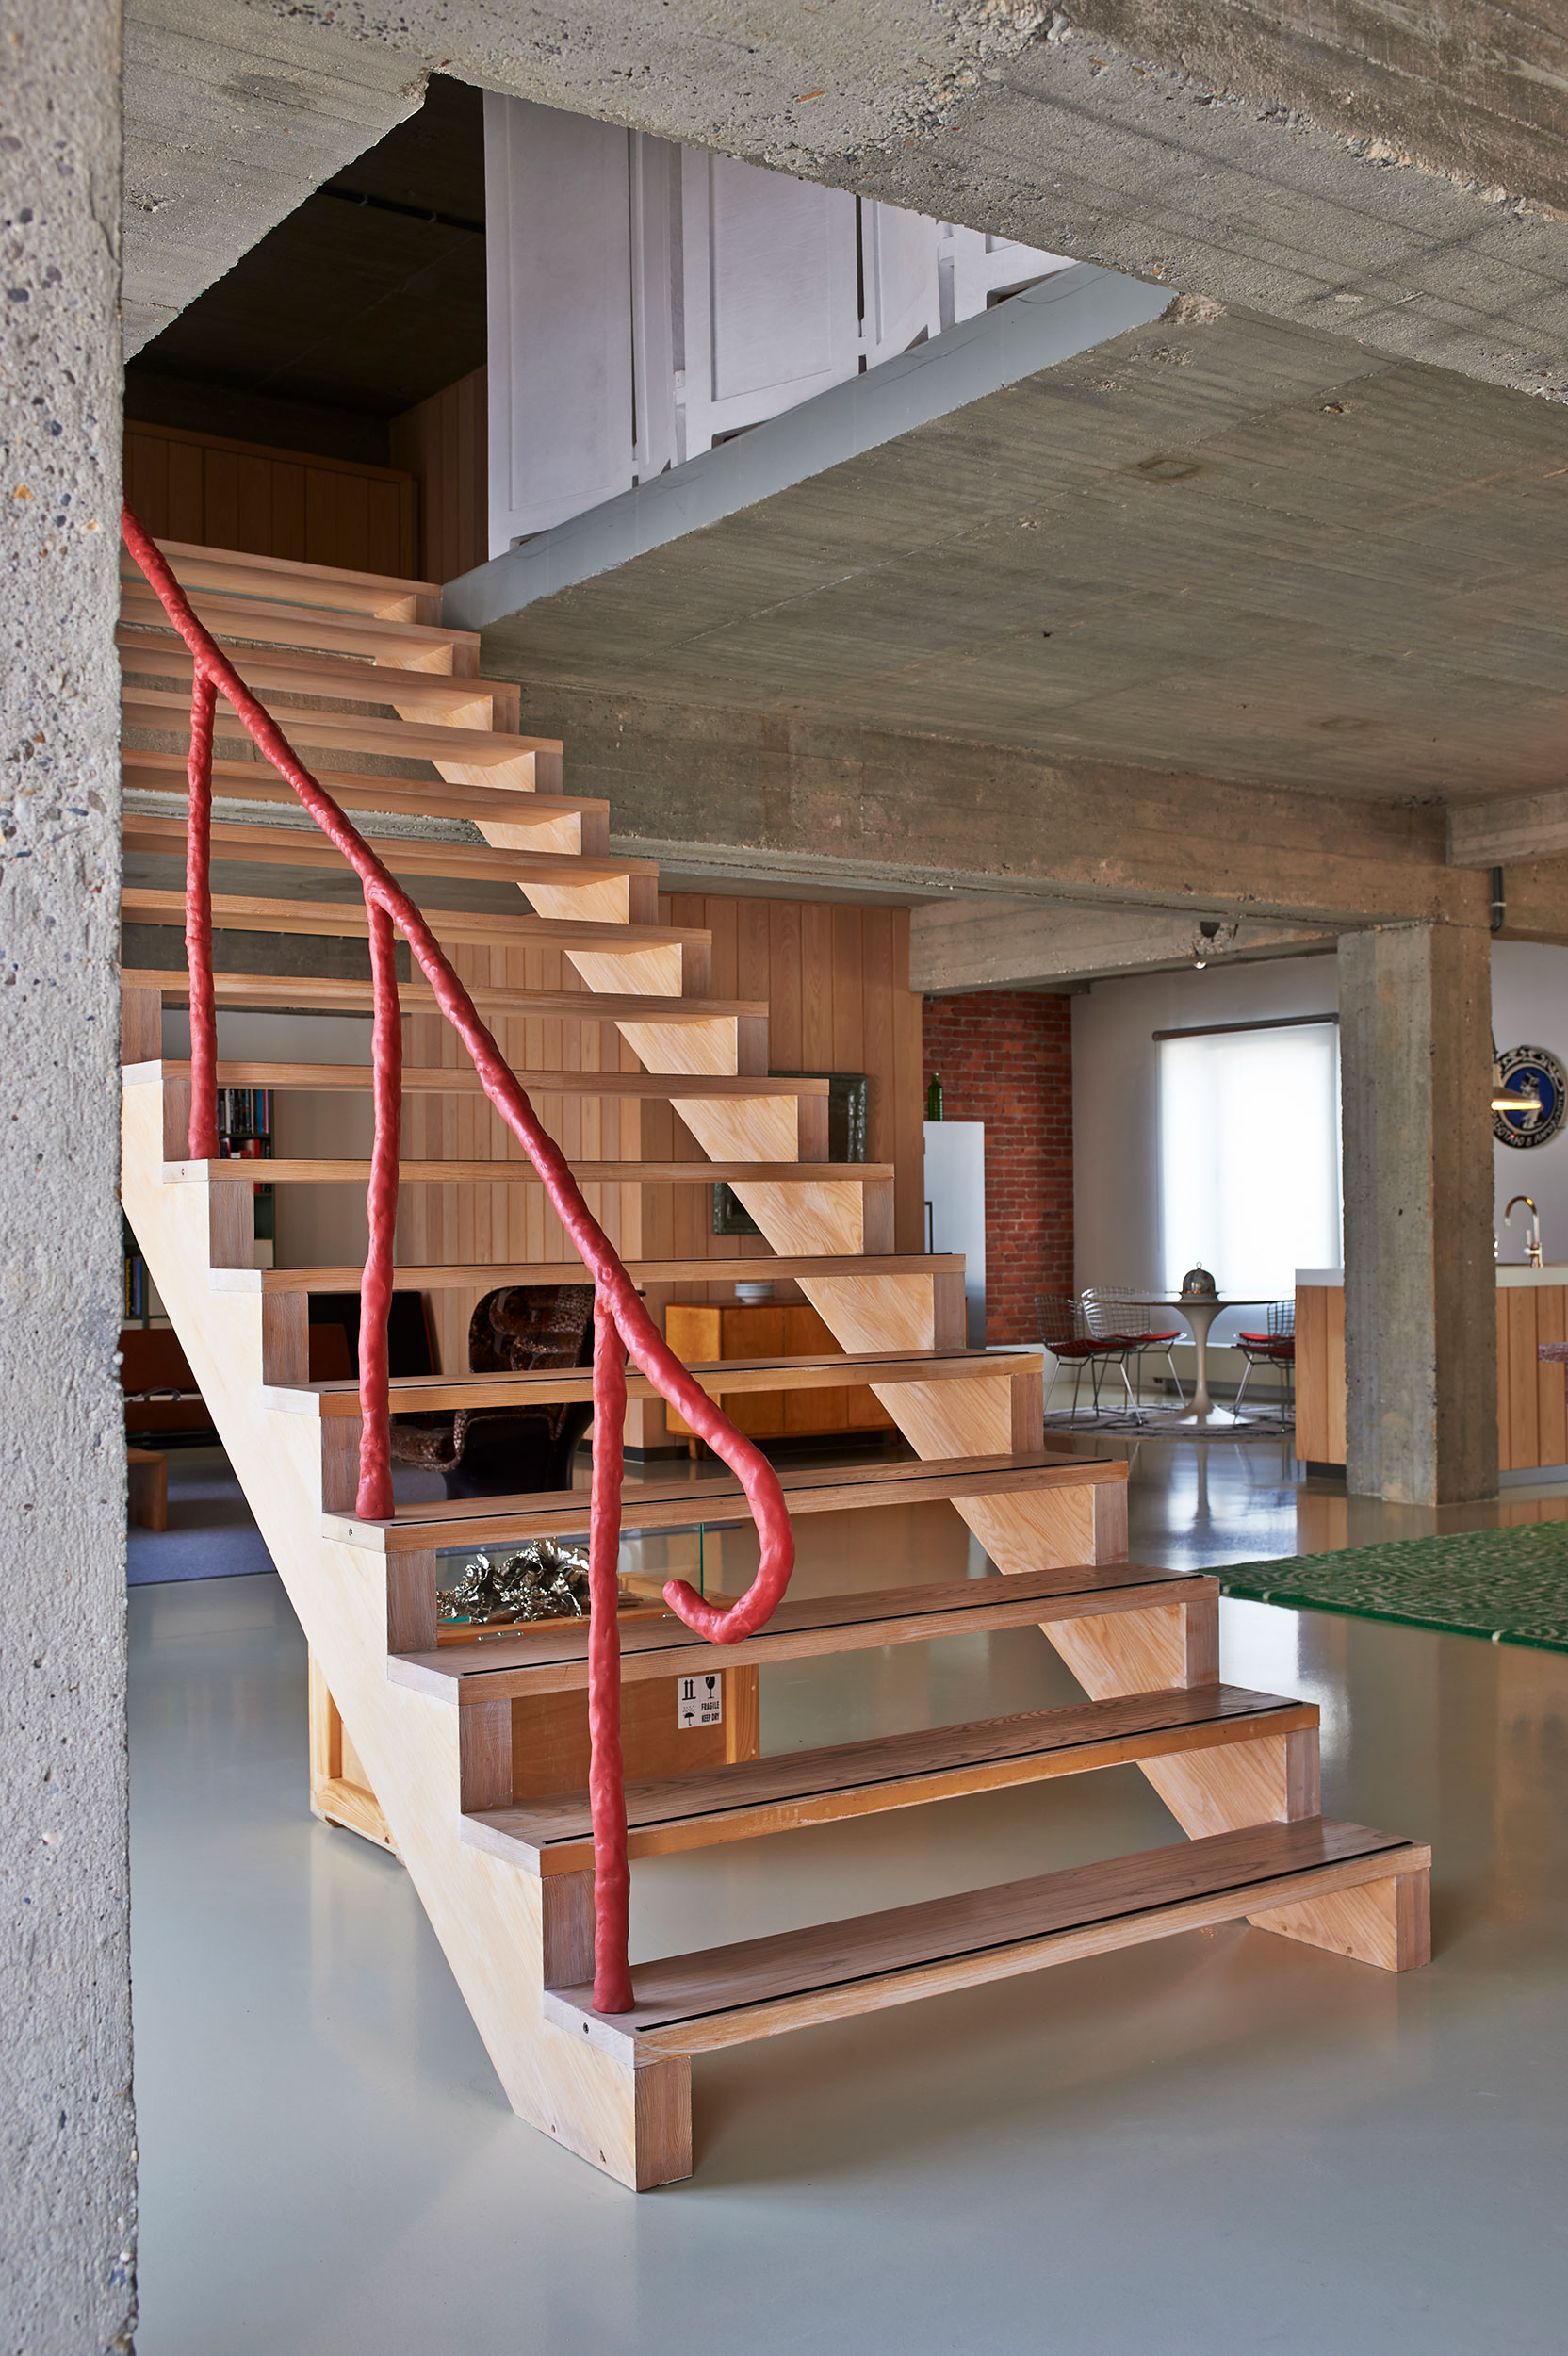 Studio-Job-Loft-1st-floor-stairs-ph-Dennis-Brandsma-22713-0126